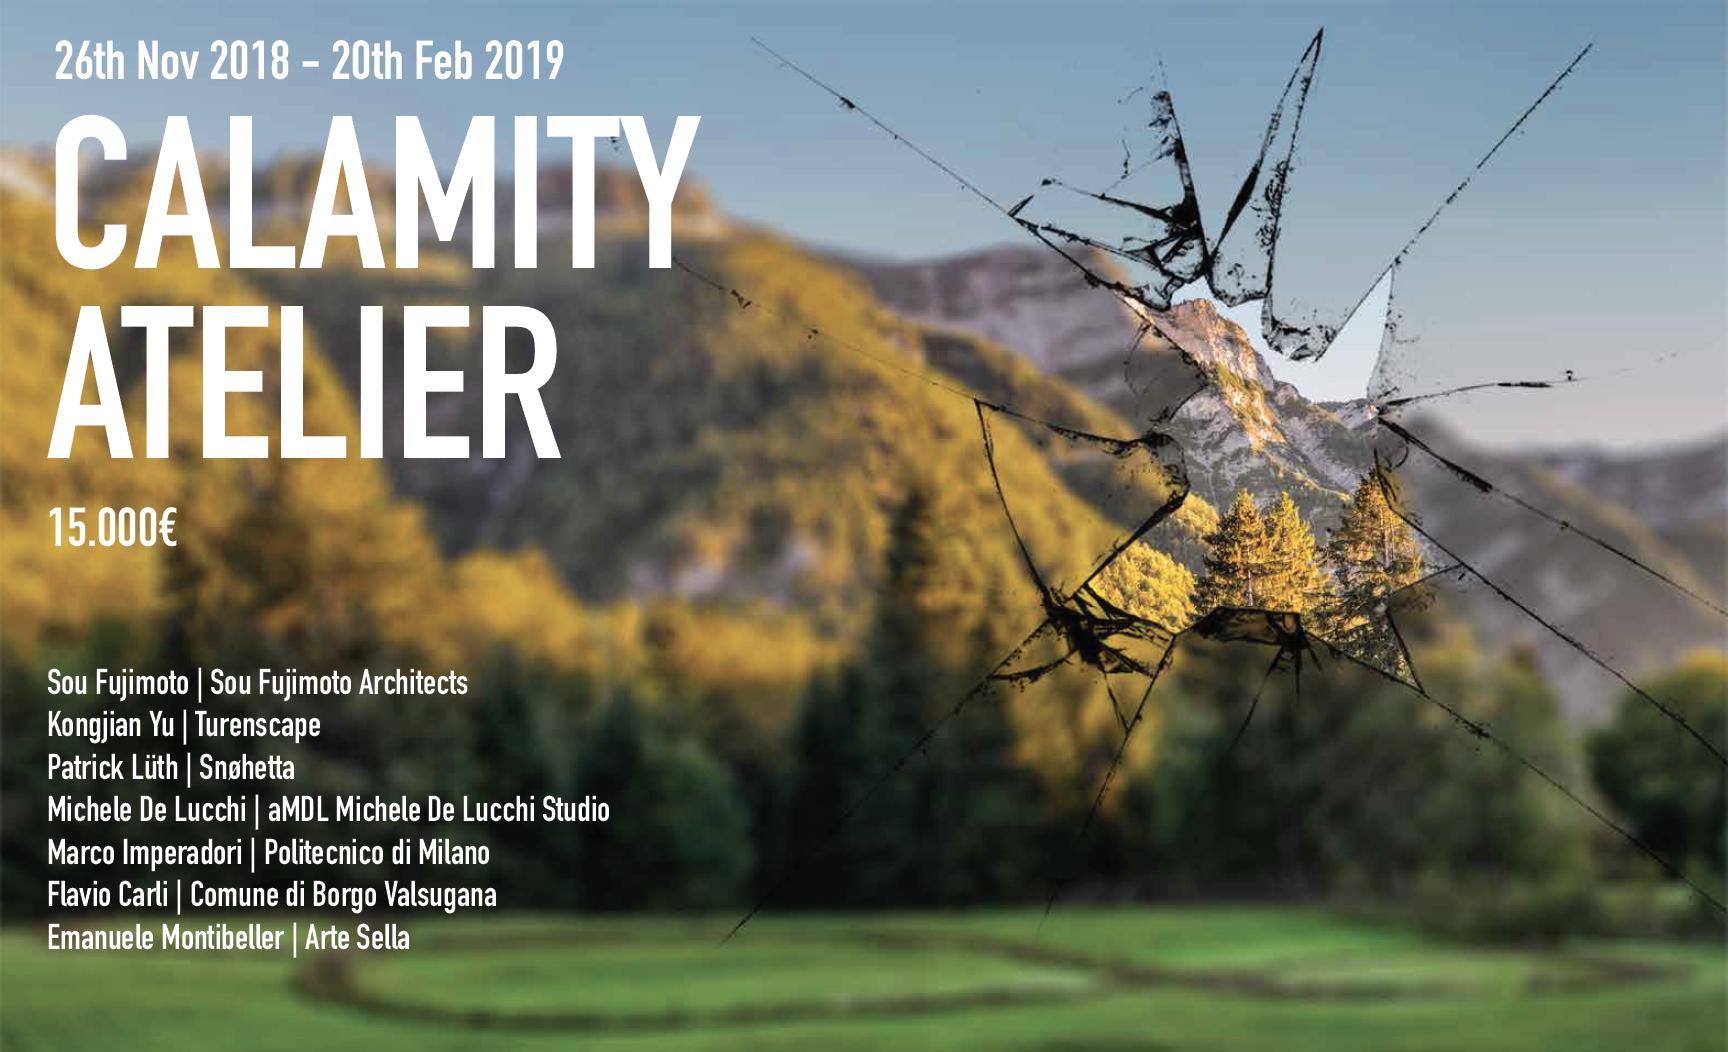 Calamity Atelier poster